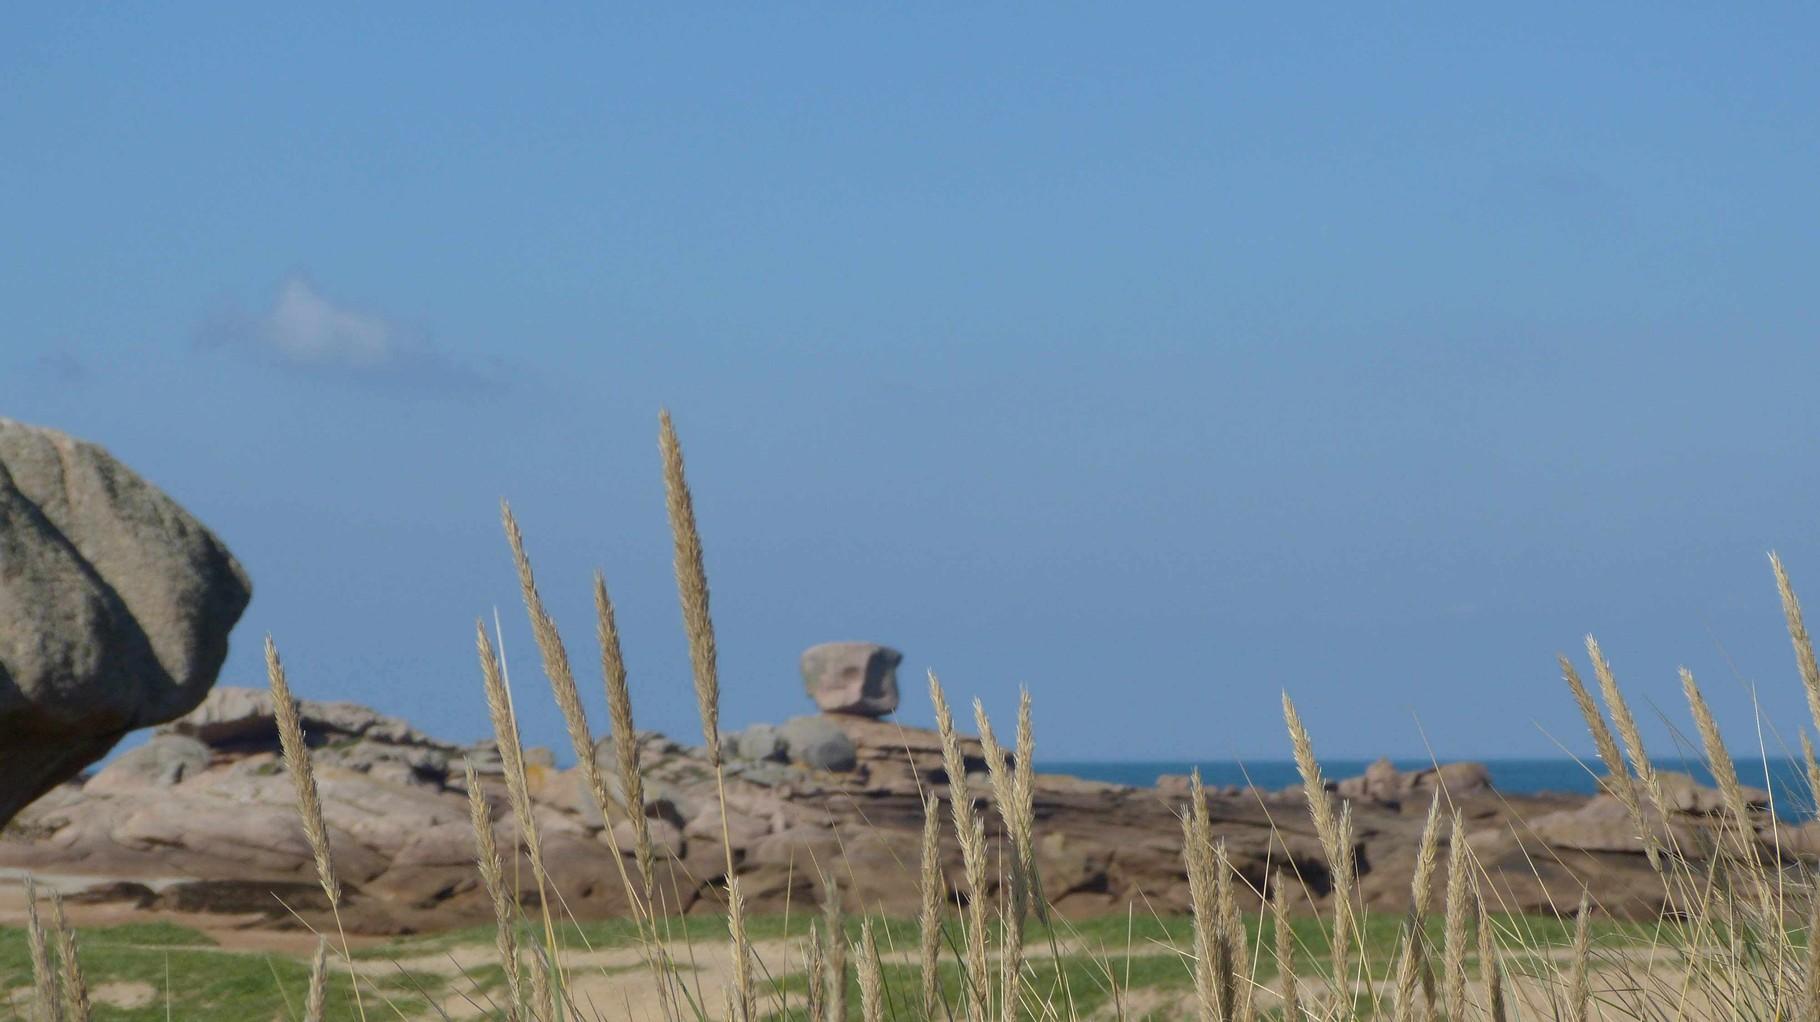 Bretagne -Tregastel, Plage du Coz Pors - Rosa Granitküste